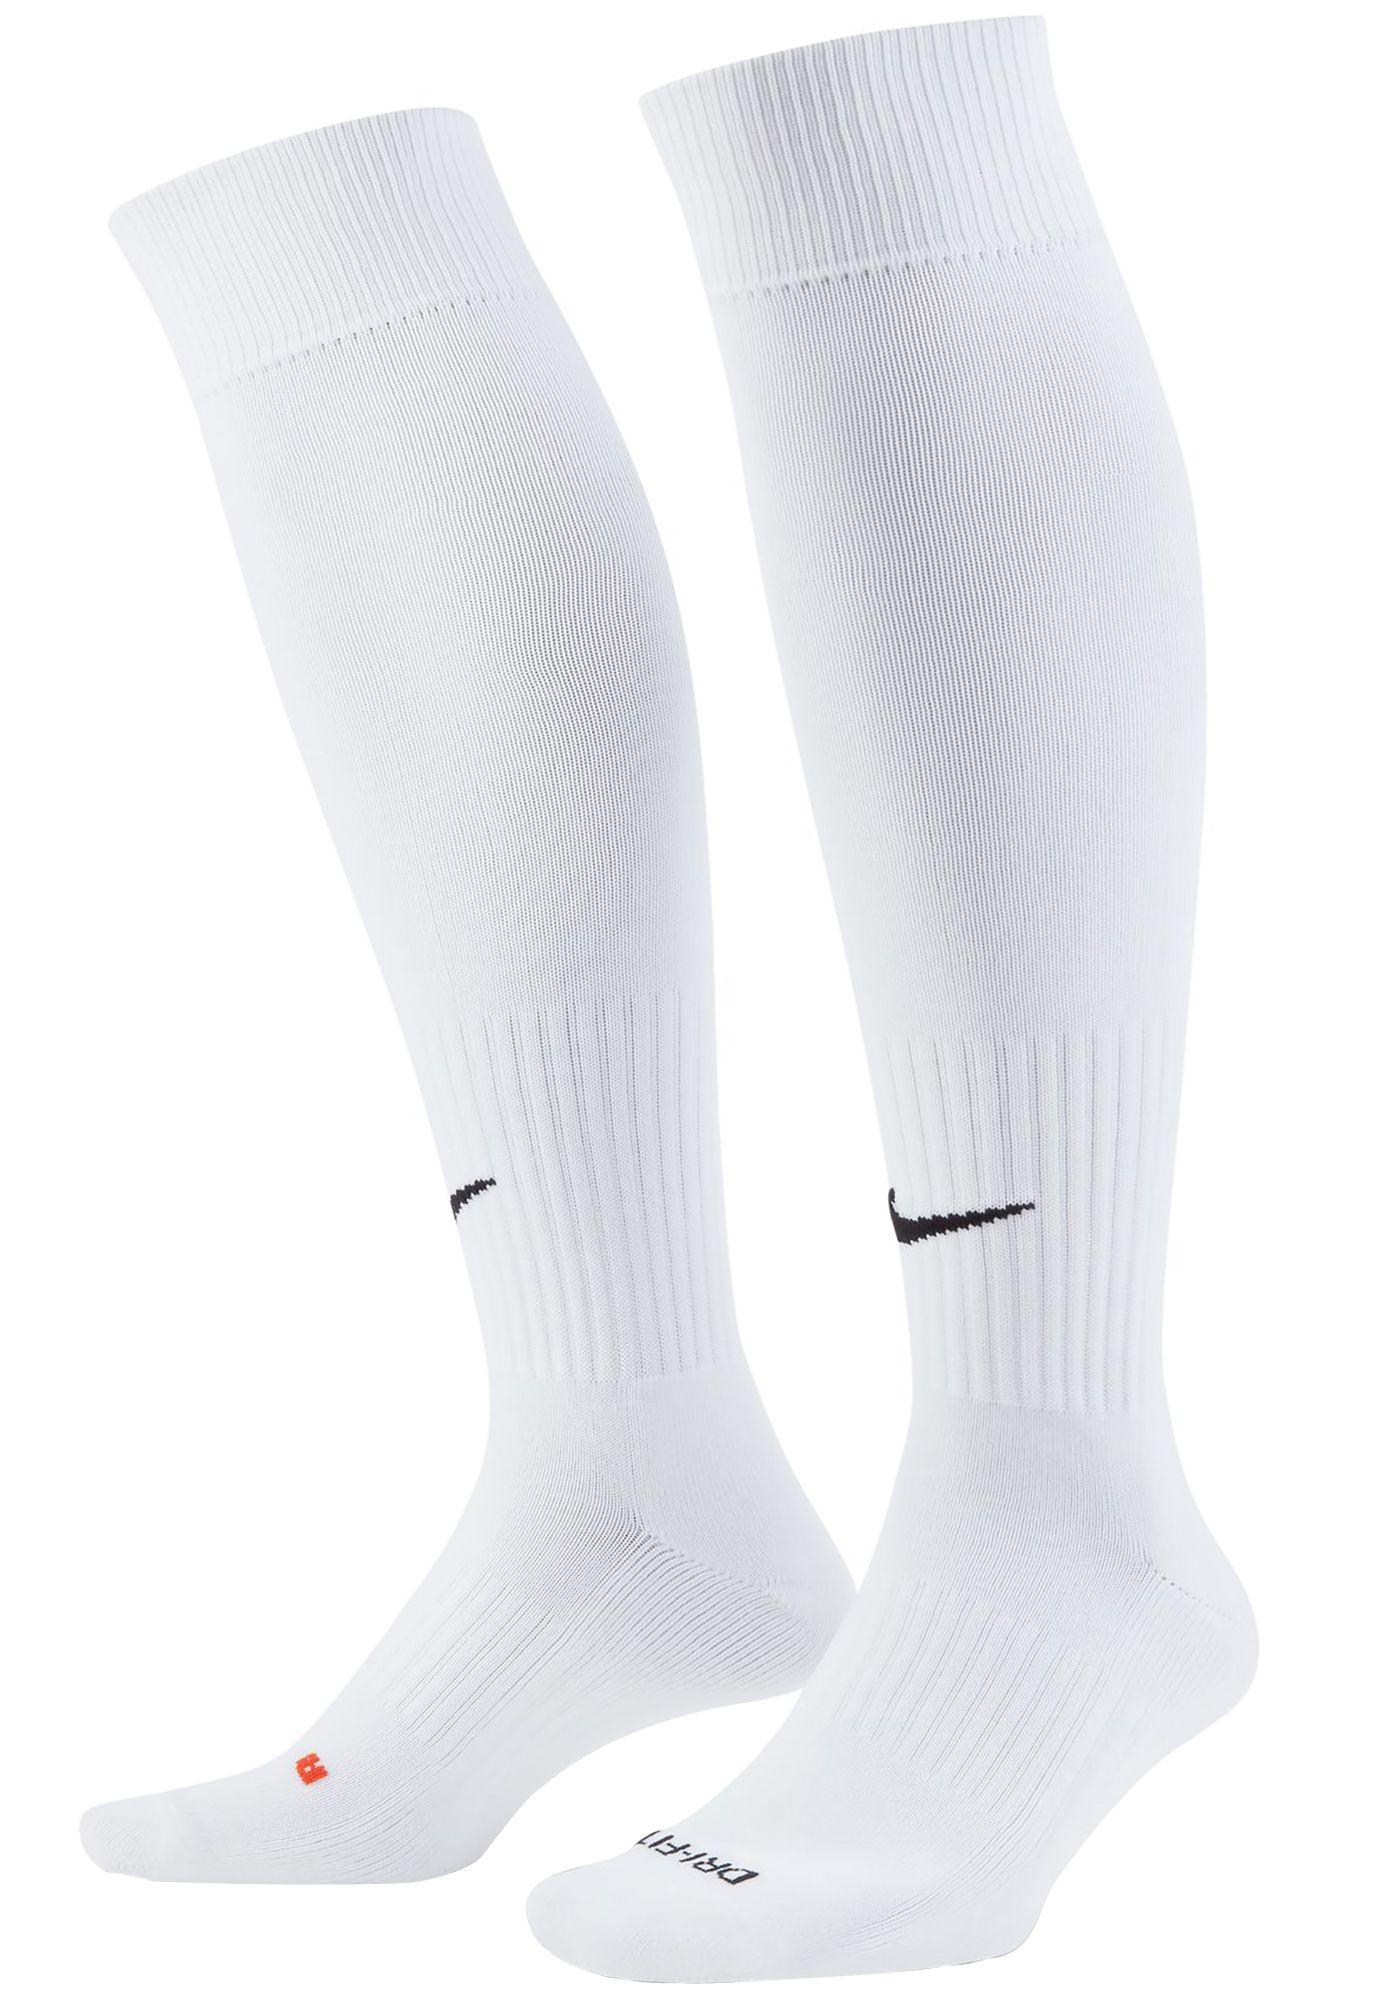 Nike Classic Soccer Socks